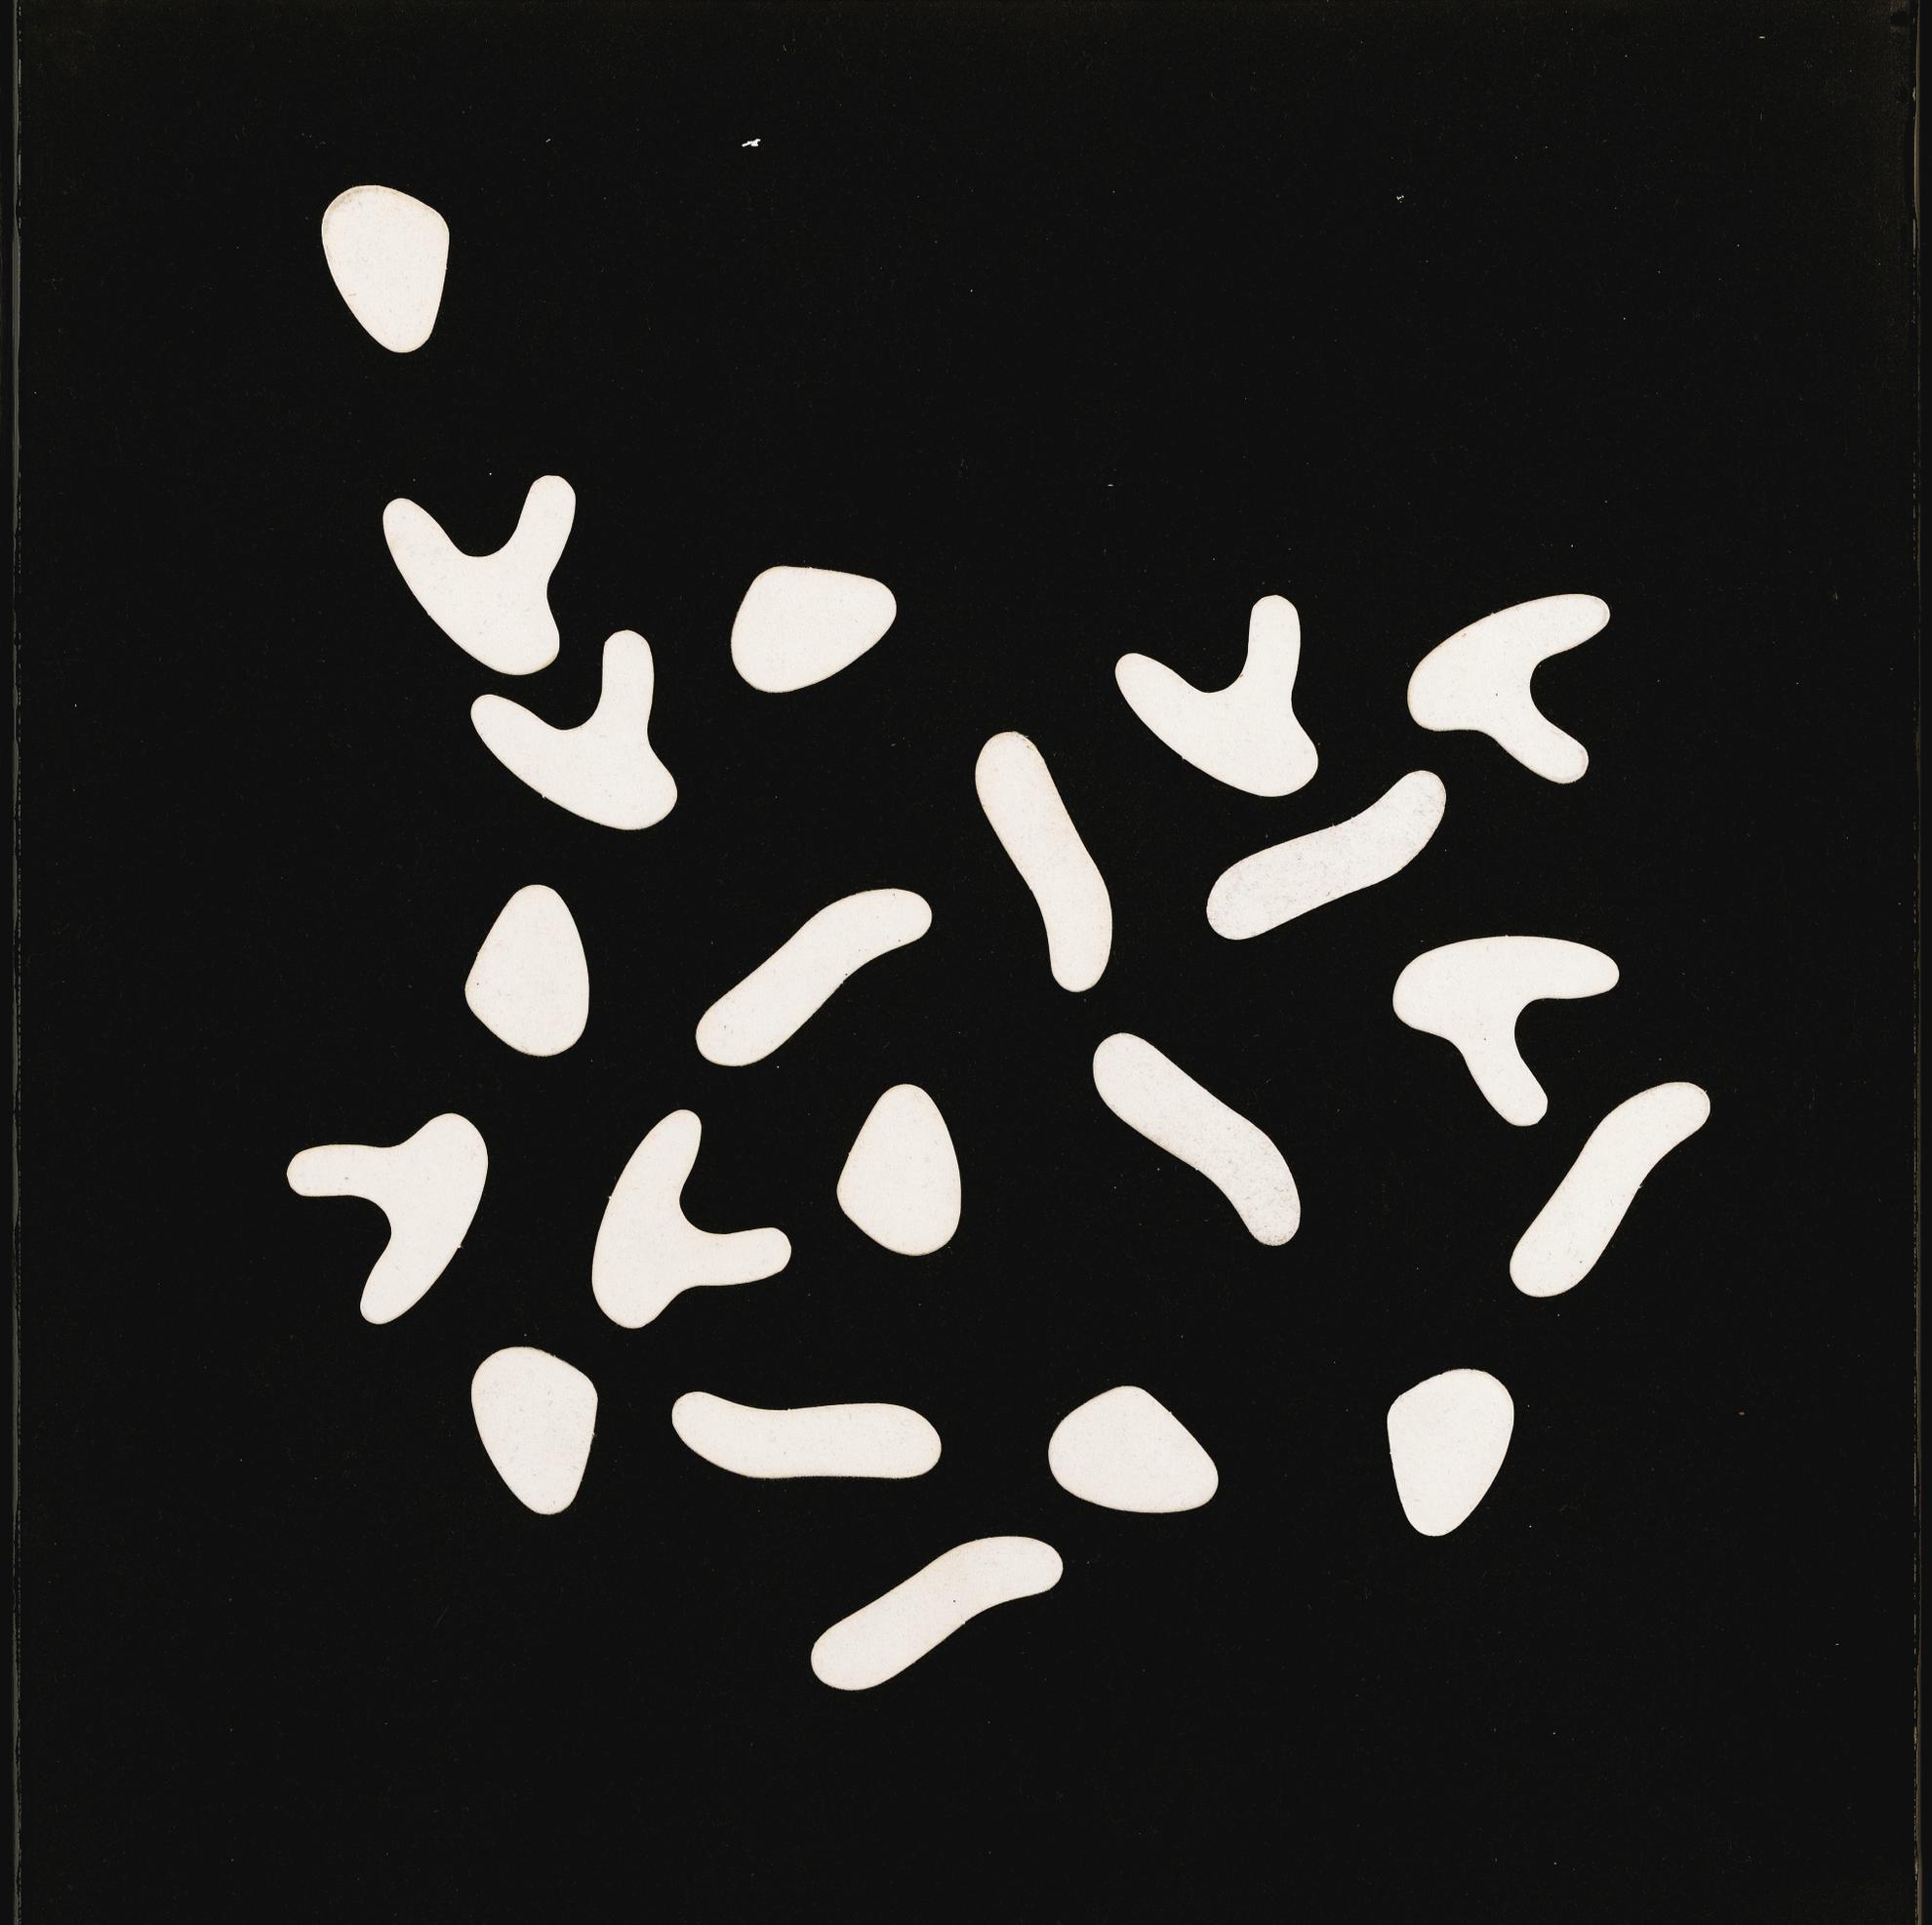 Jean Arp-Variables Bild (3 X 7 = 21 Formen)-1964